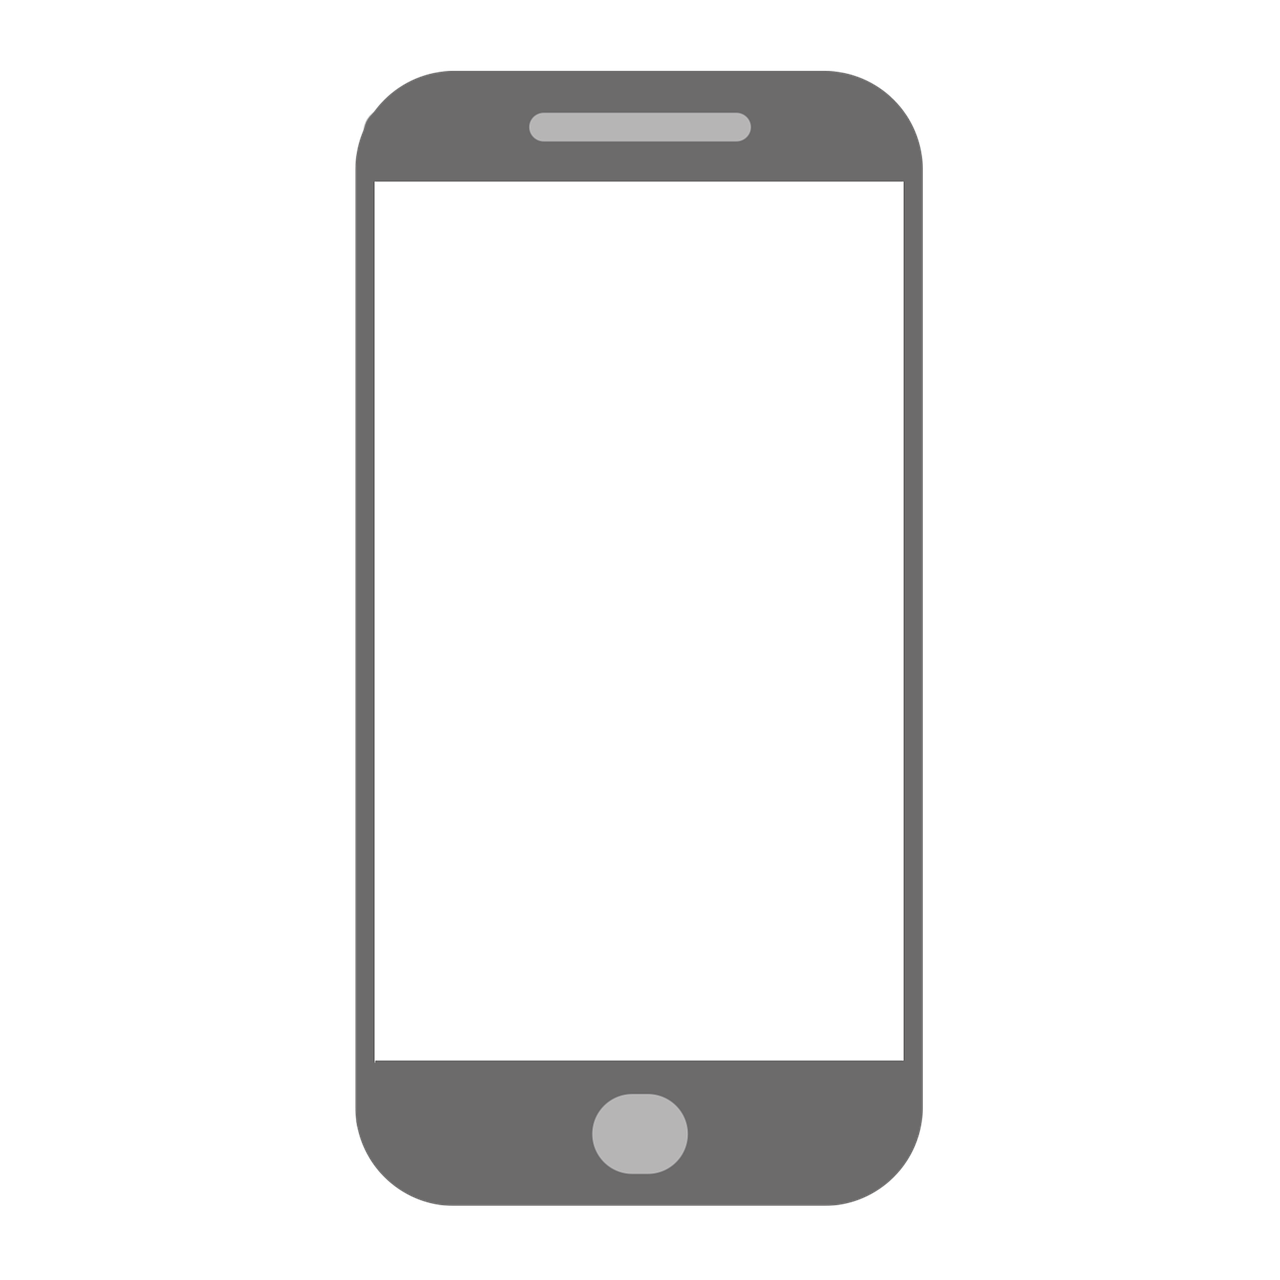 mobile, phone, smartphone